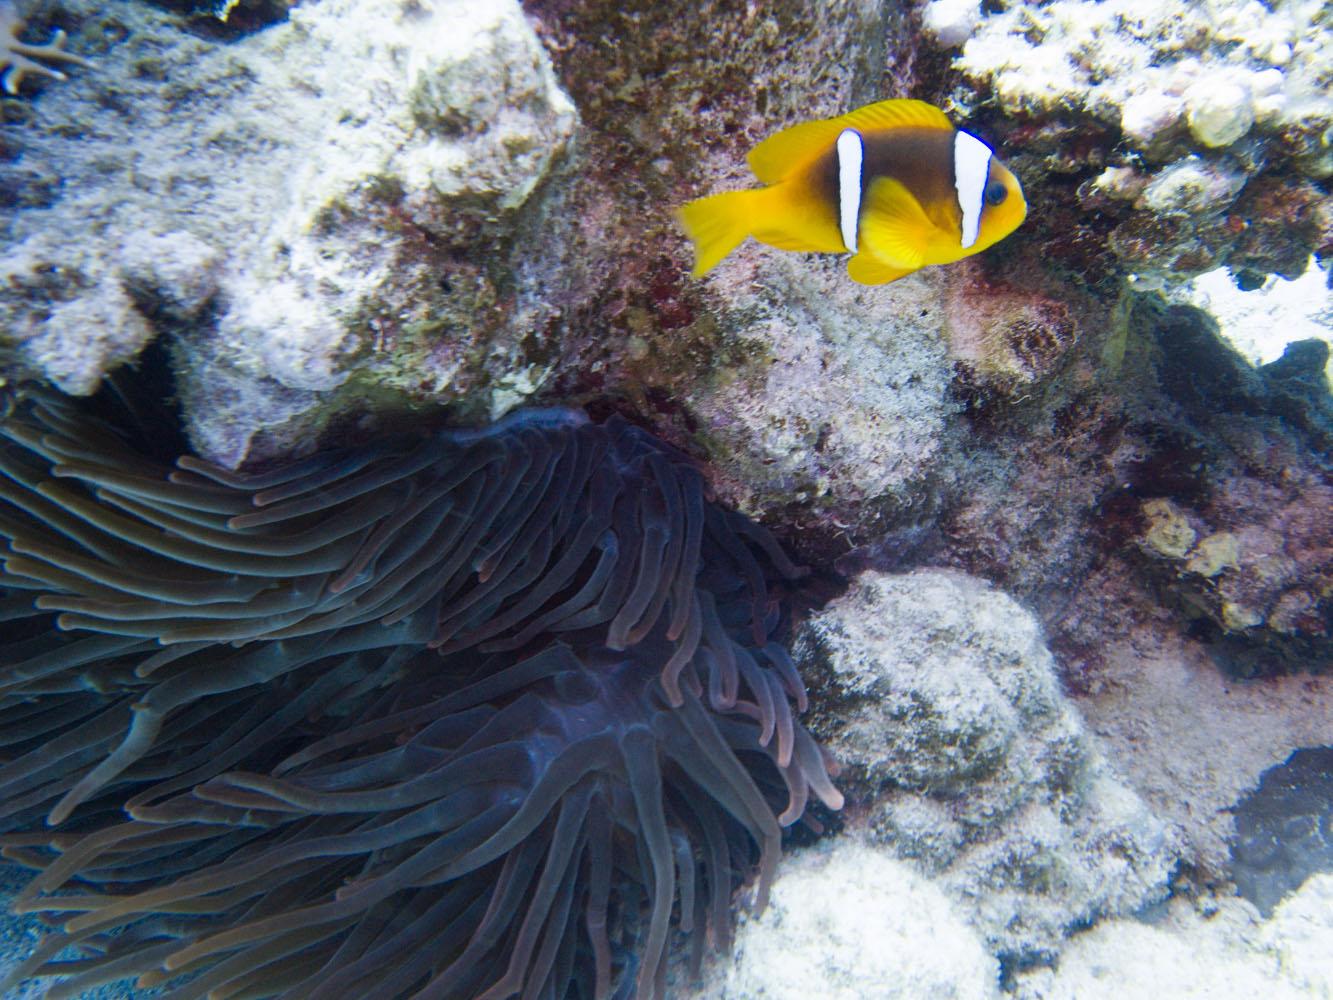 Lahami_Bay_Rotes_Meer_Red Sea Diving Safari_-5